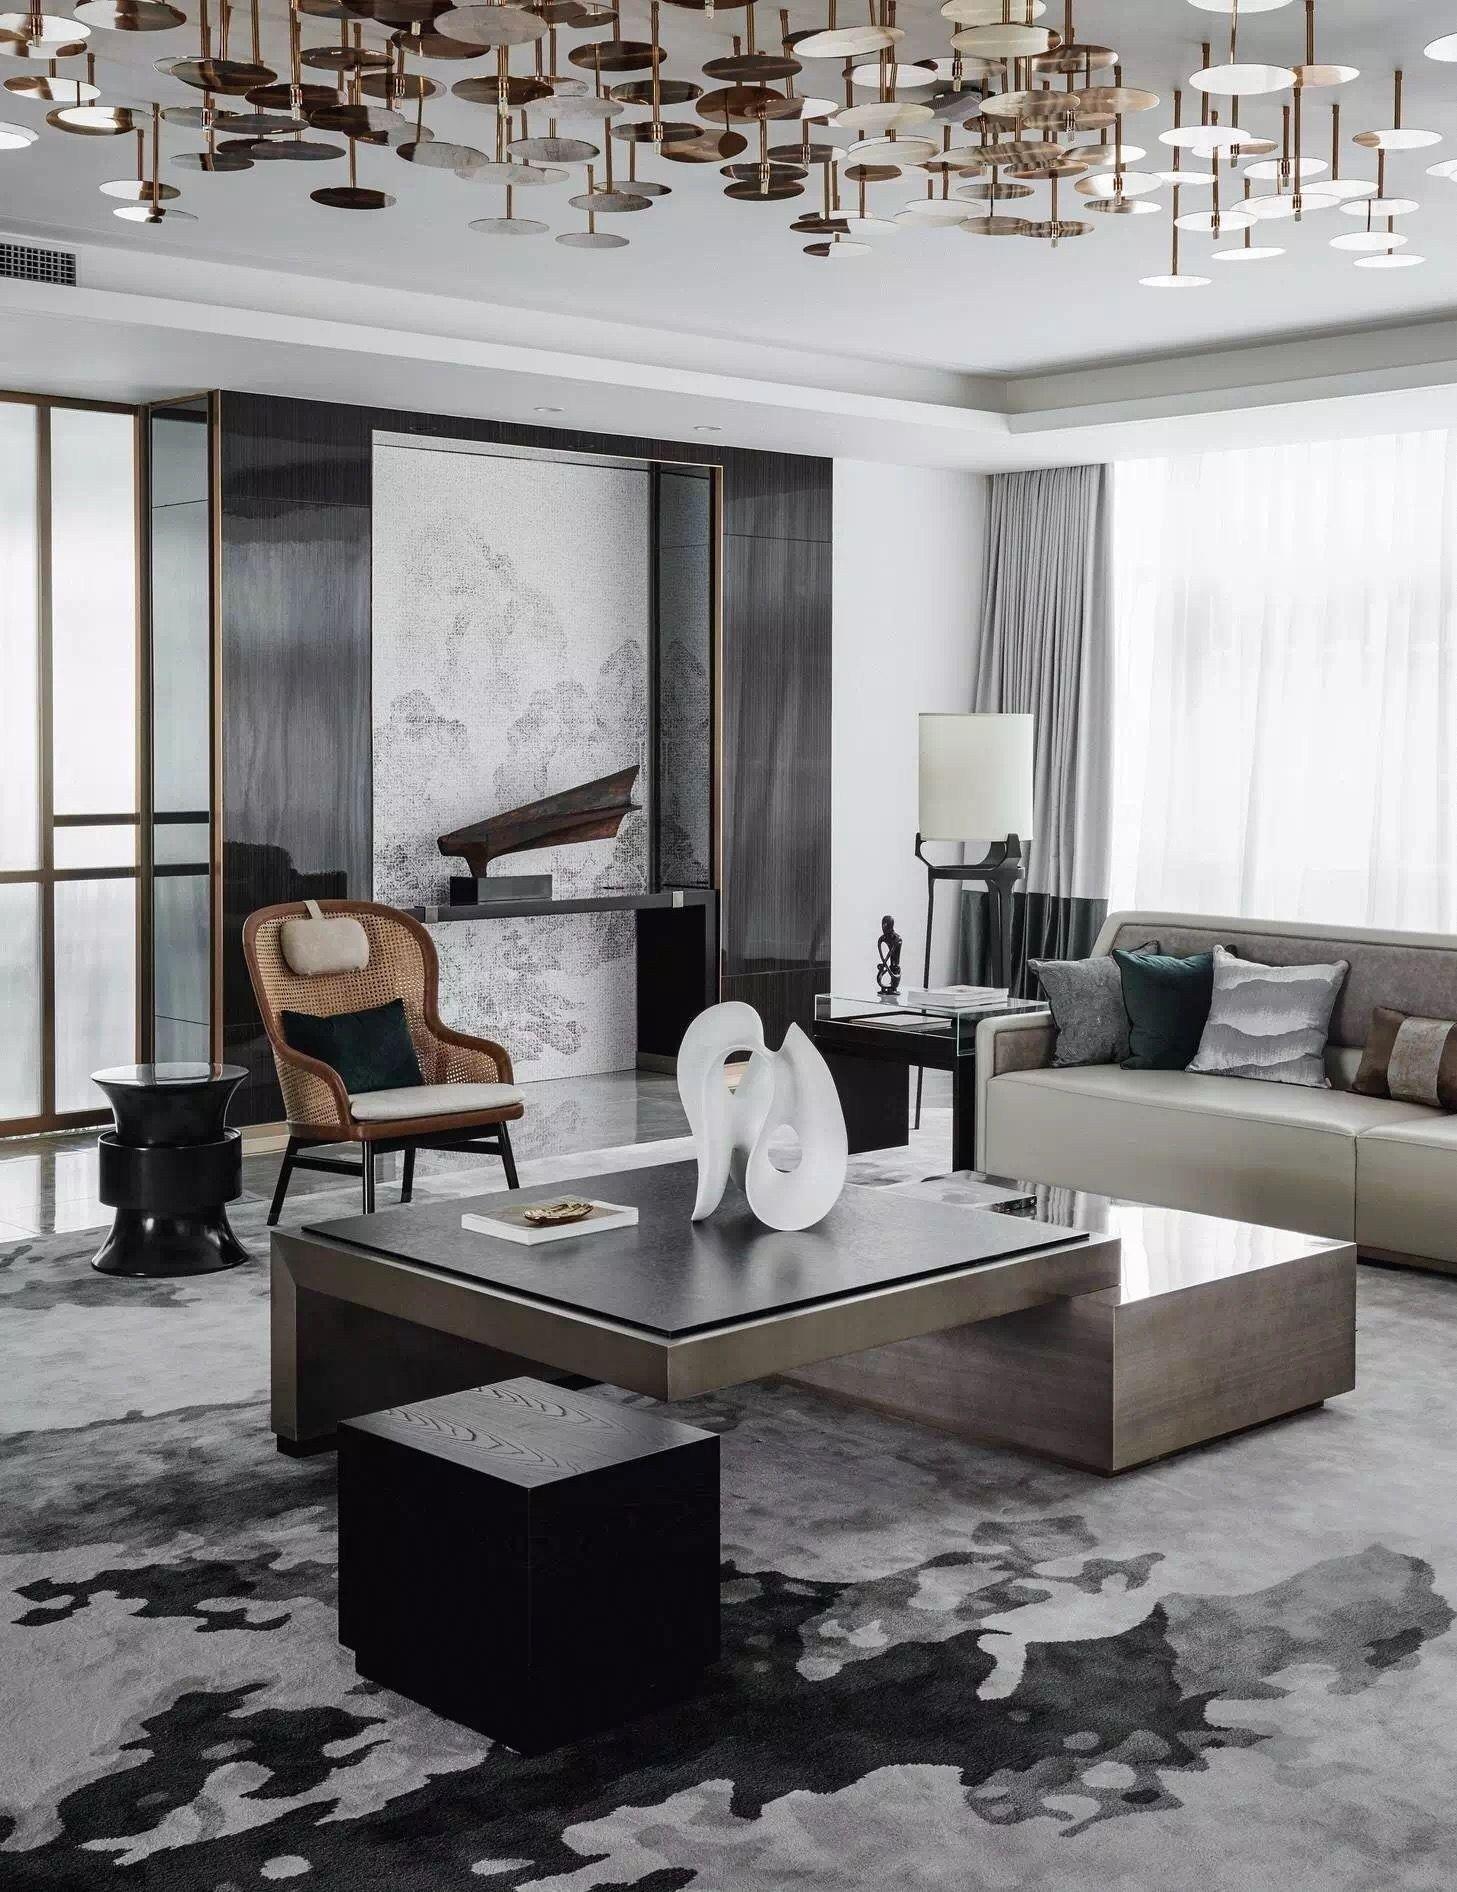 33+ amazing contemporary living room design ideas. if you